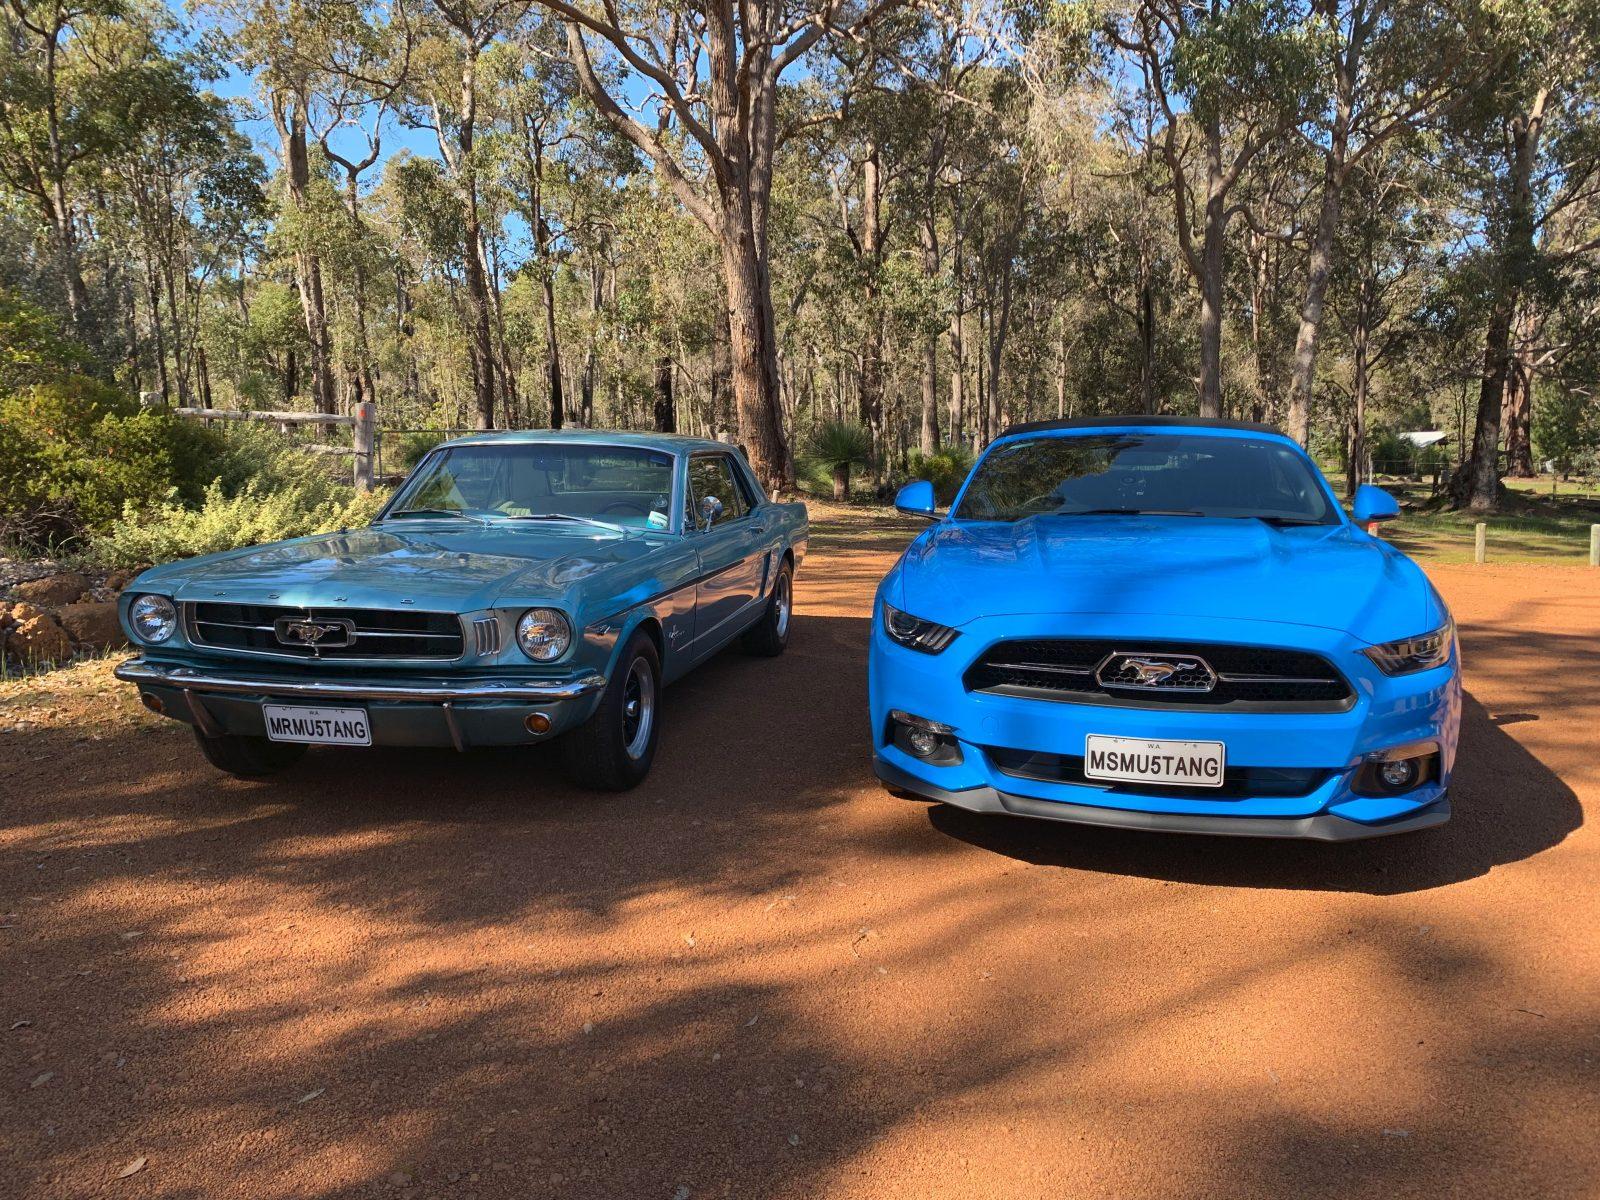 Mr Mustang Hire, Margaret River, Western Australia